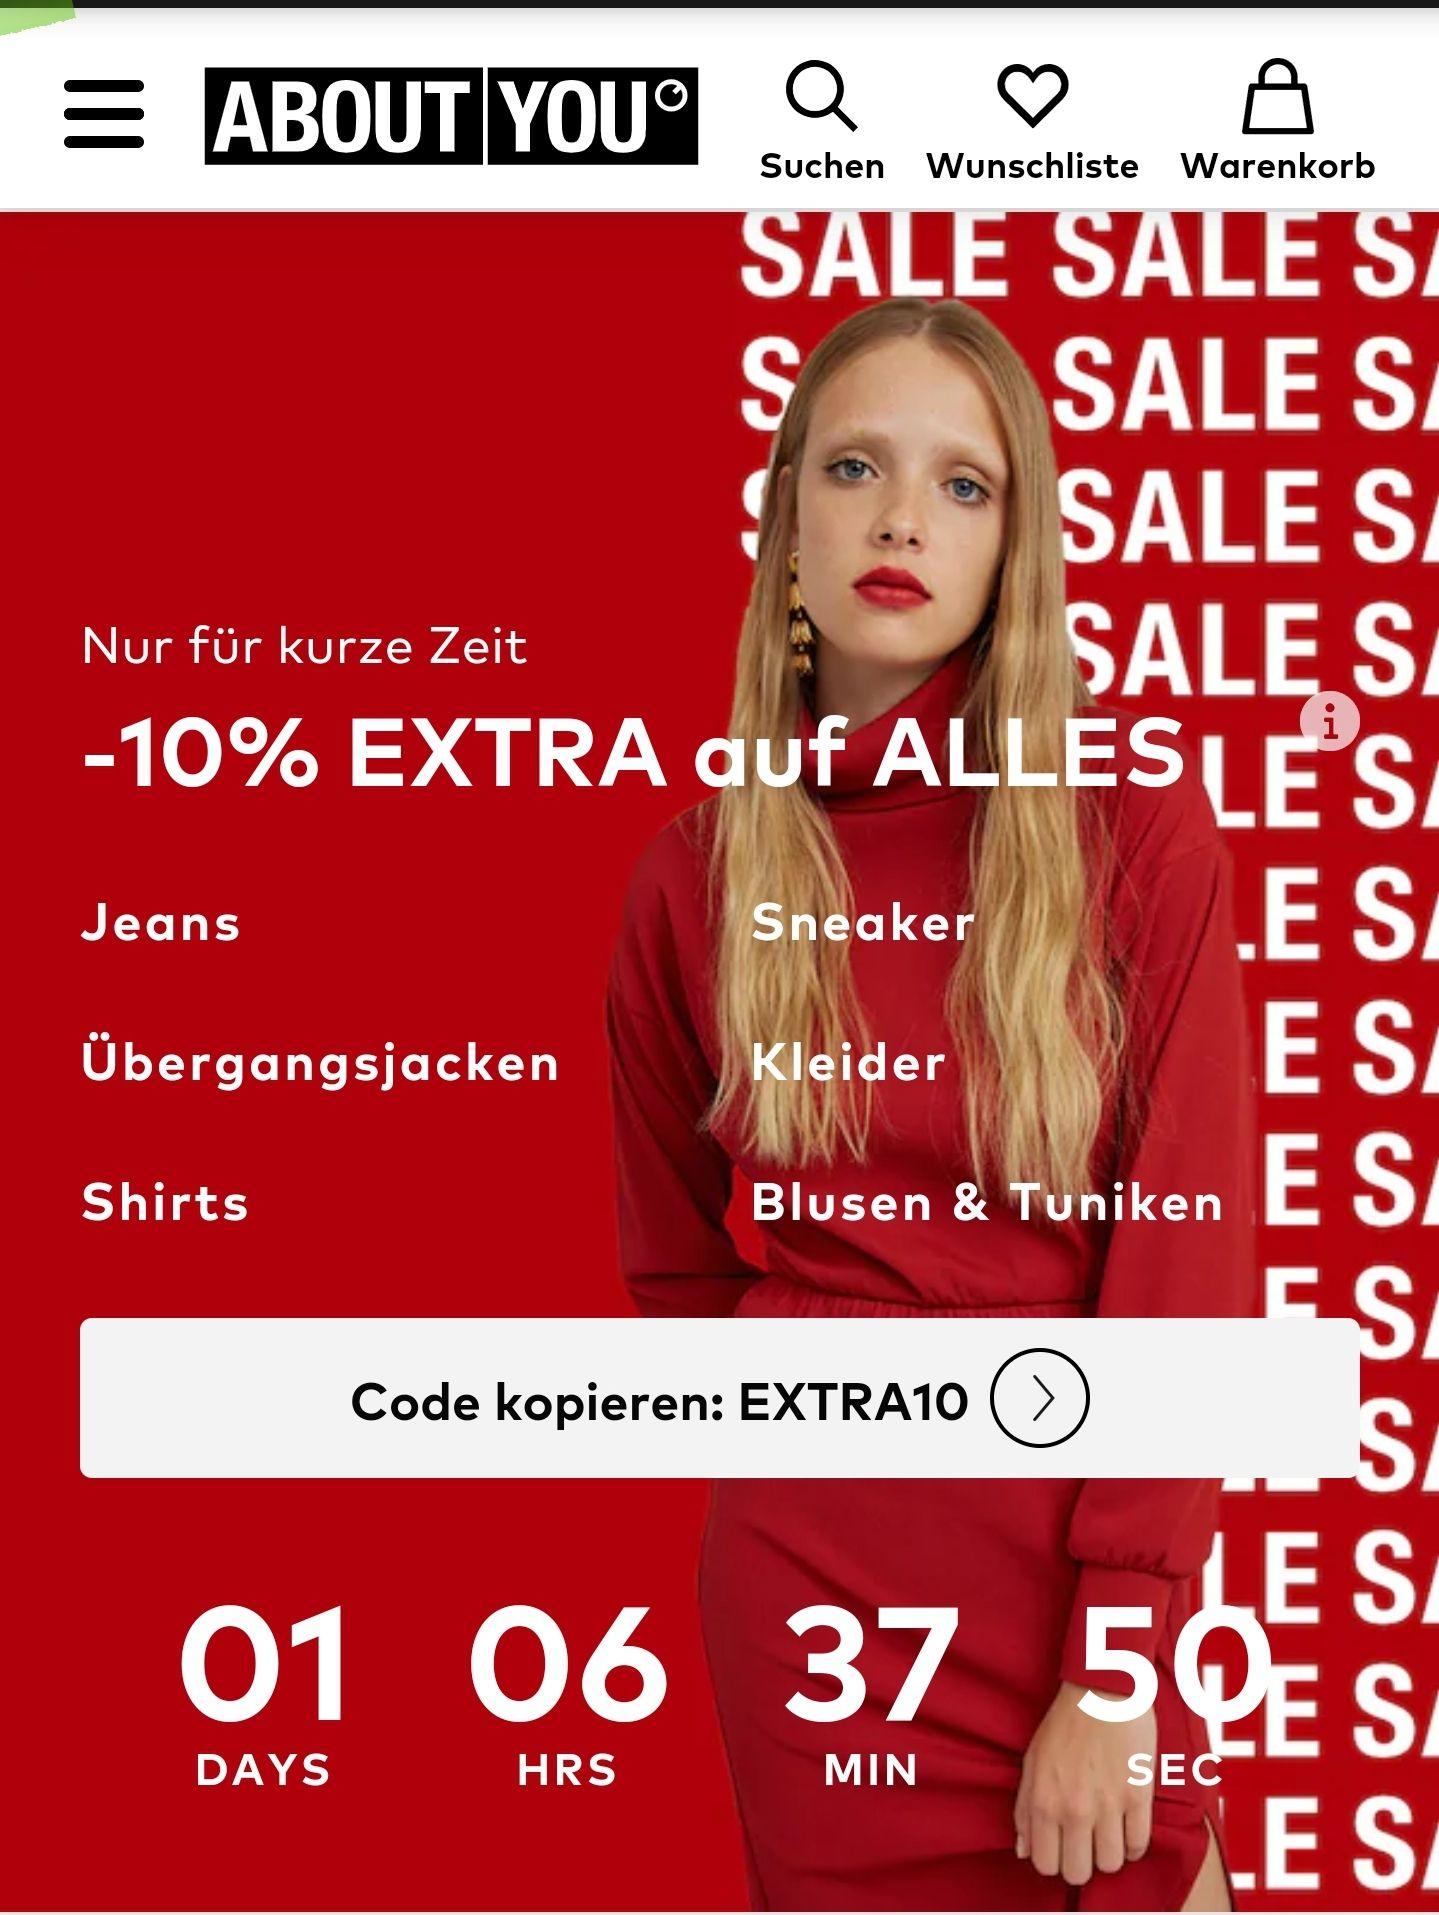 AboutYou -10% auf Alles* MBW 75,00€